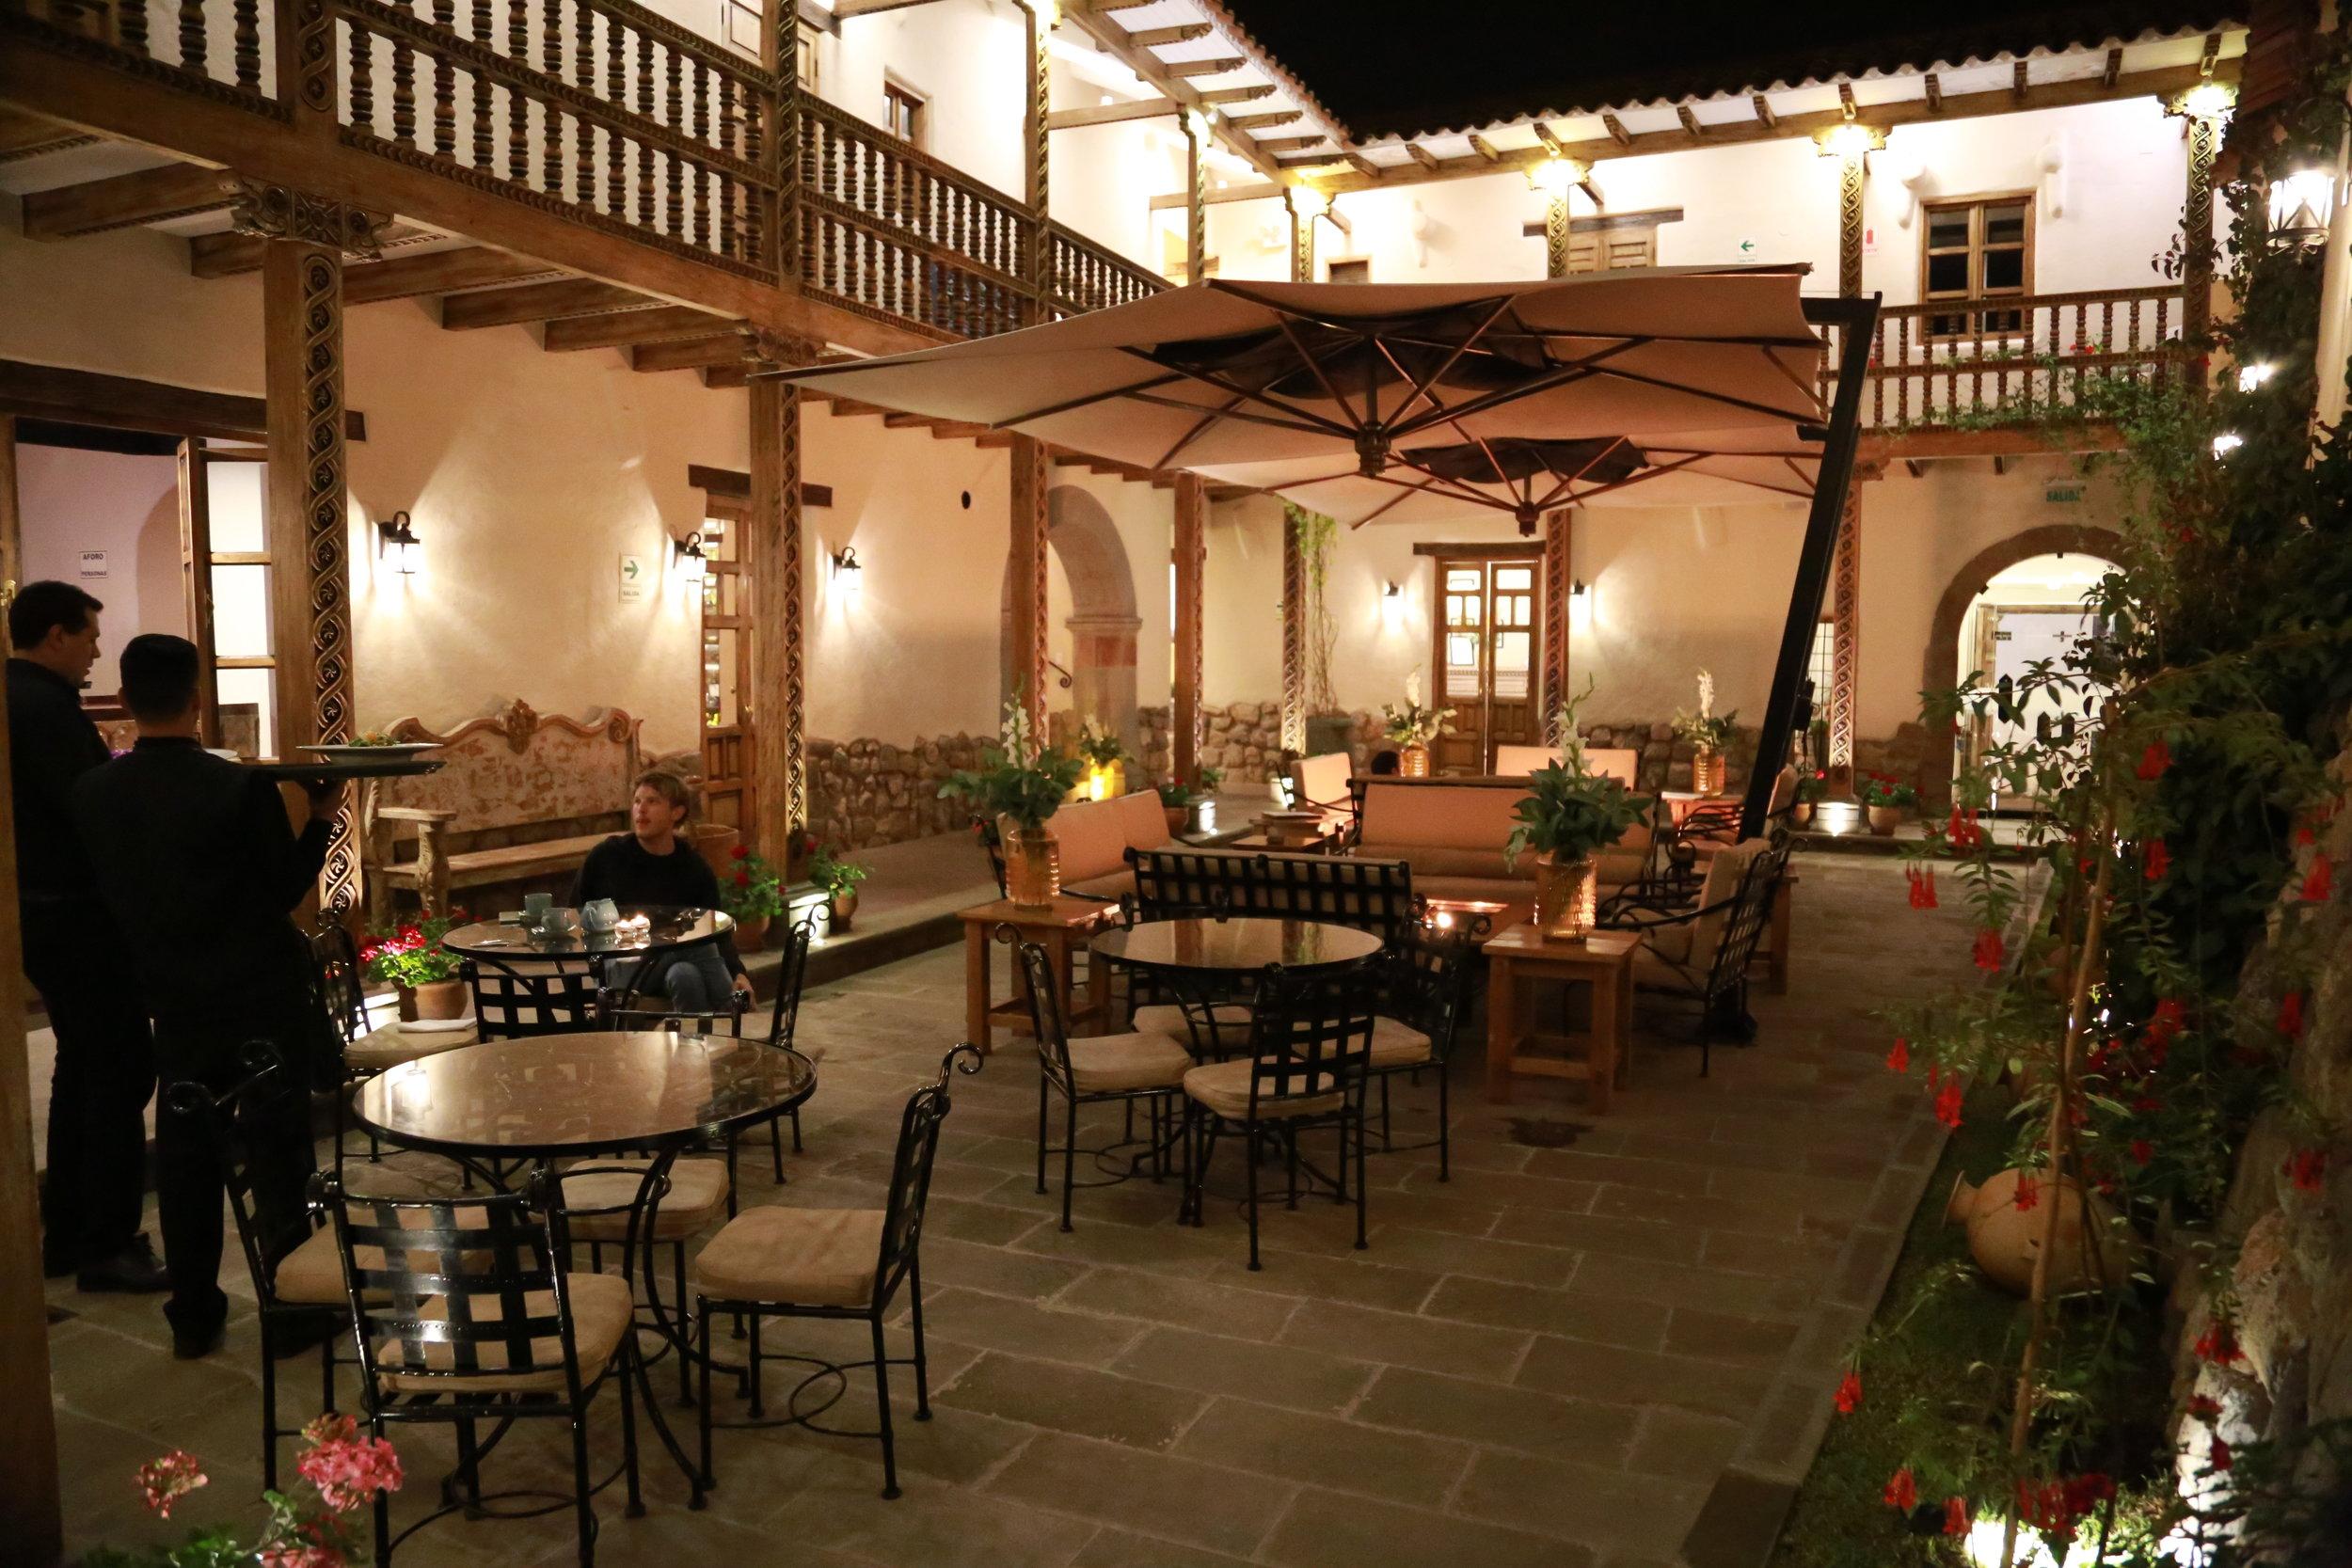 Courtyard and restaurant at Antigua Casona San Blas in Cusco, Perú.